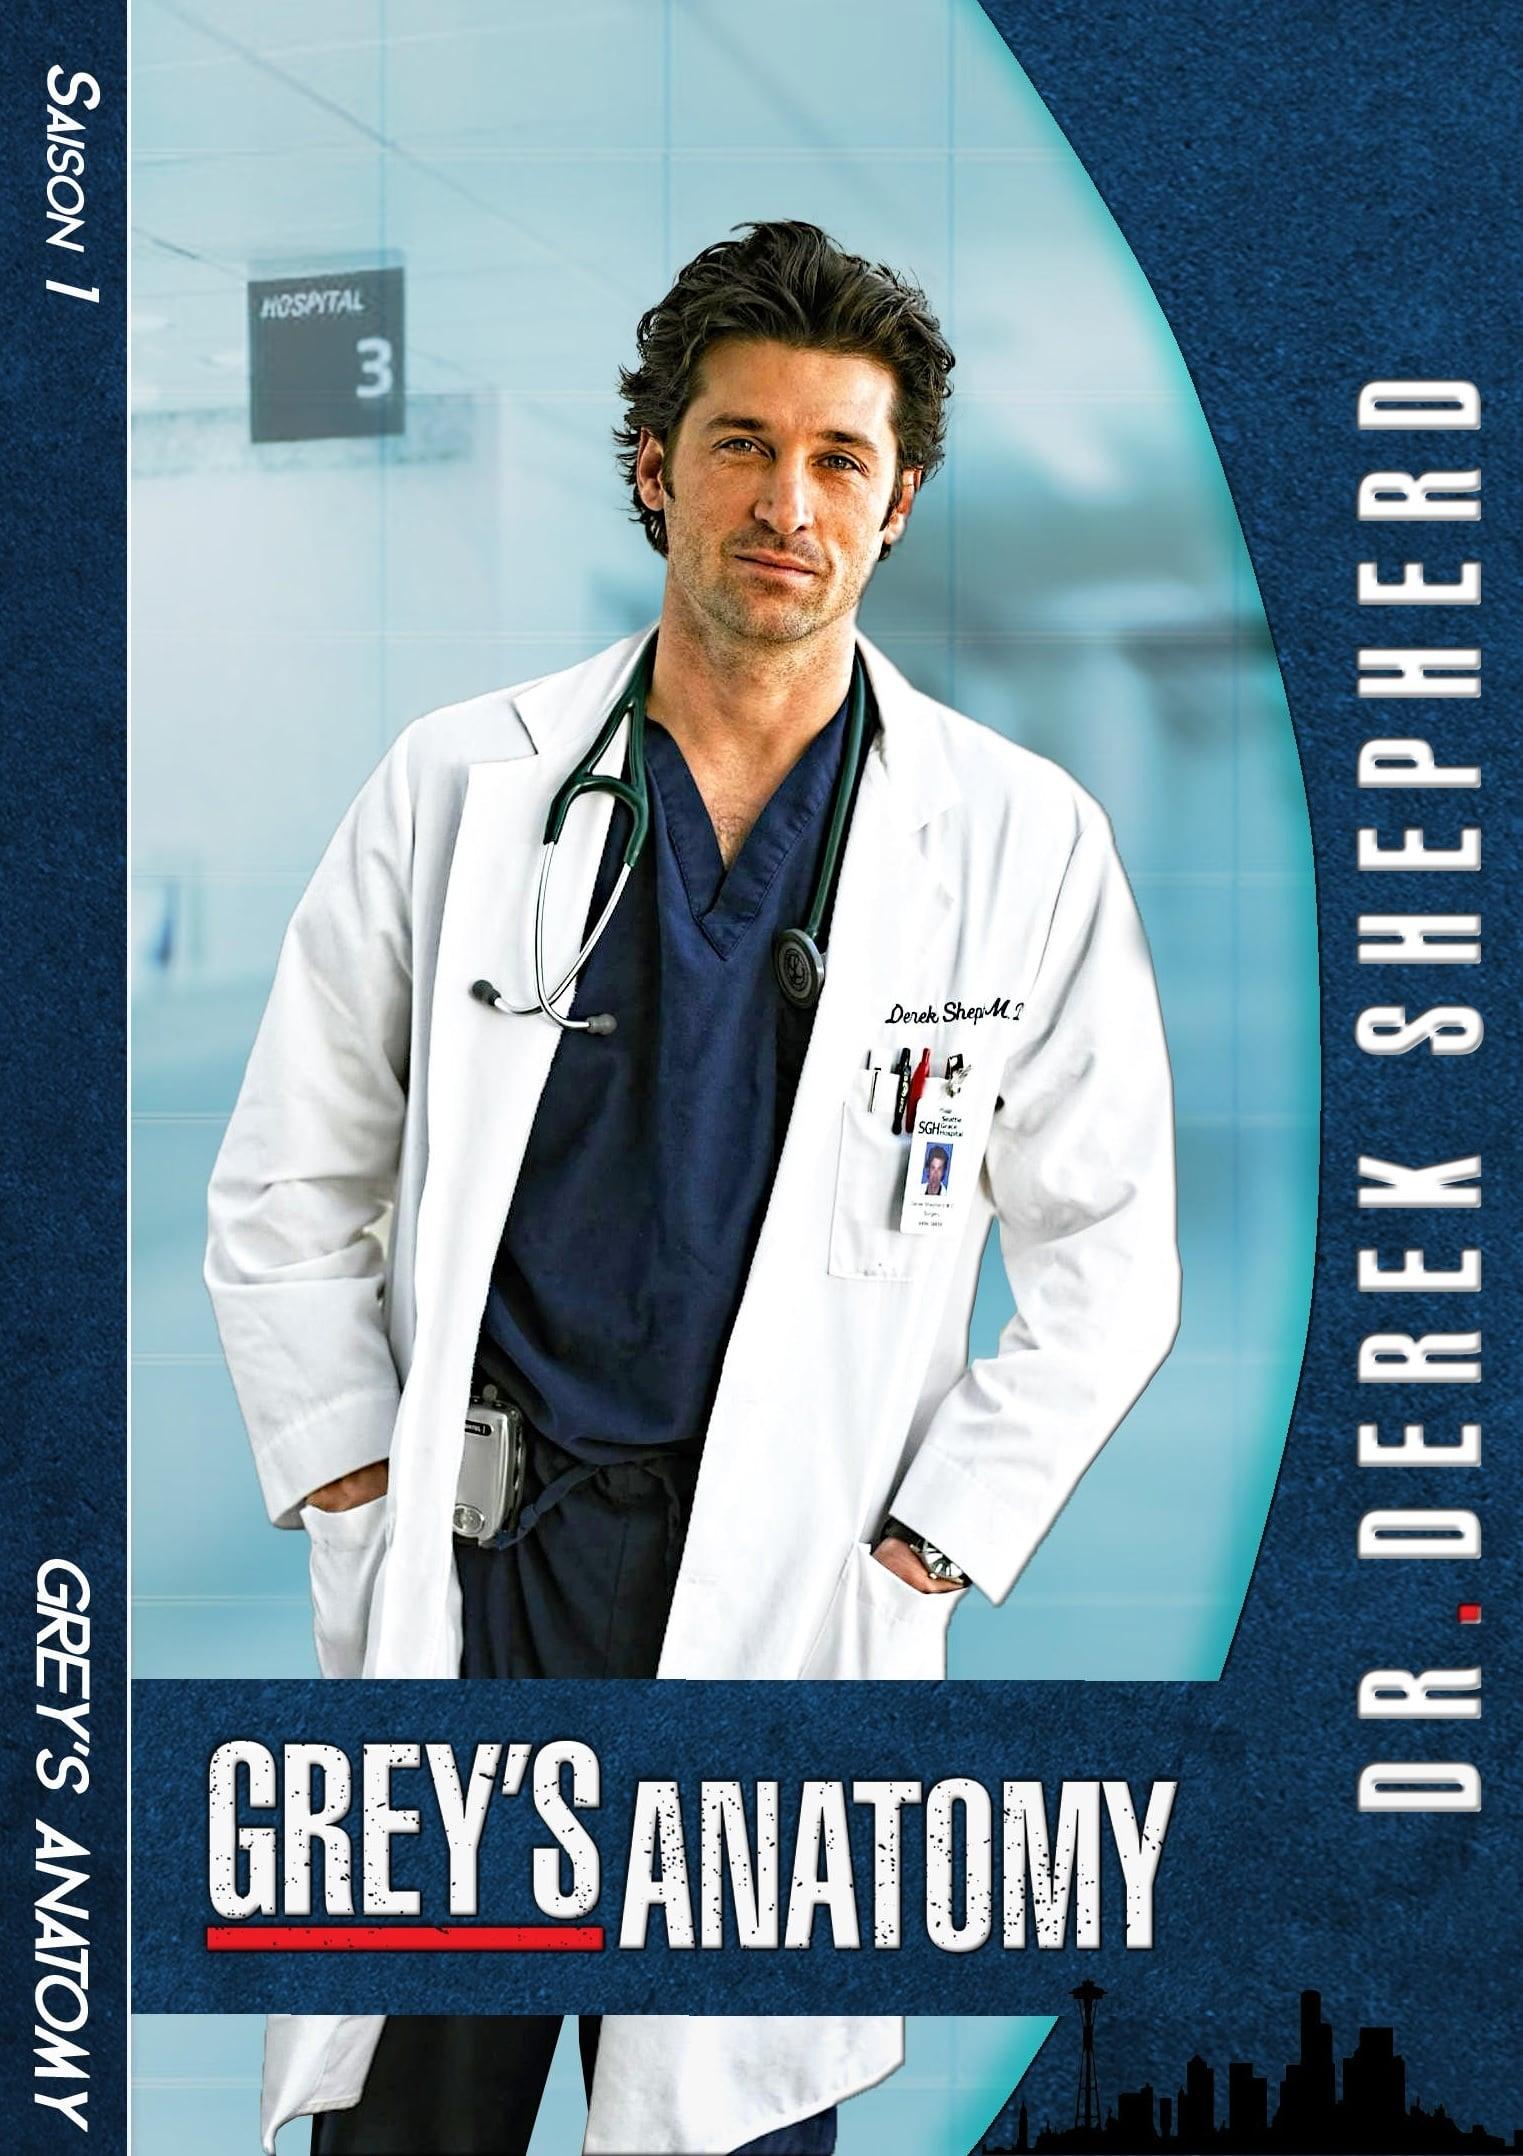 Grey's Anatomy Streaming Vost : grey's, anatomy, streaming, Grey's, Anatomy, Streaming, Telechargement, Serie